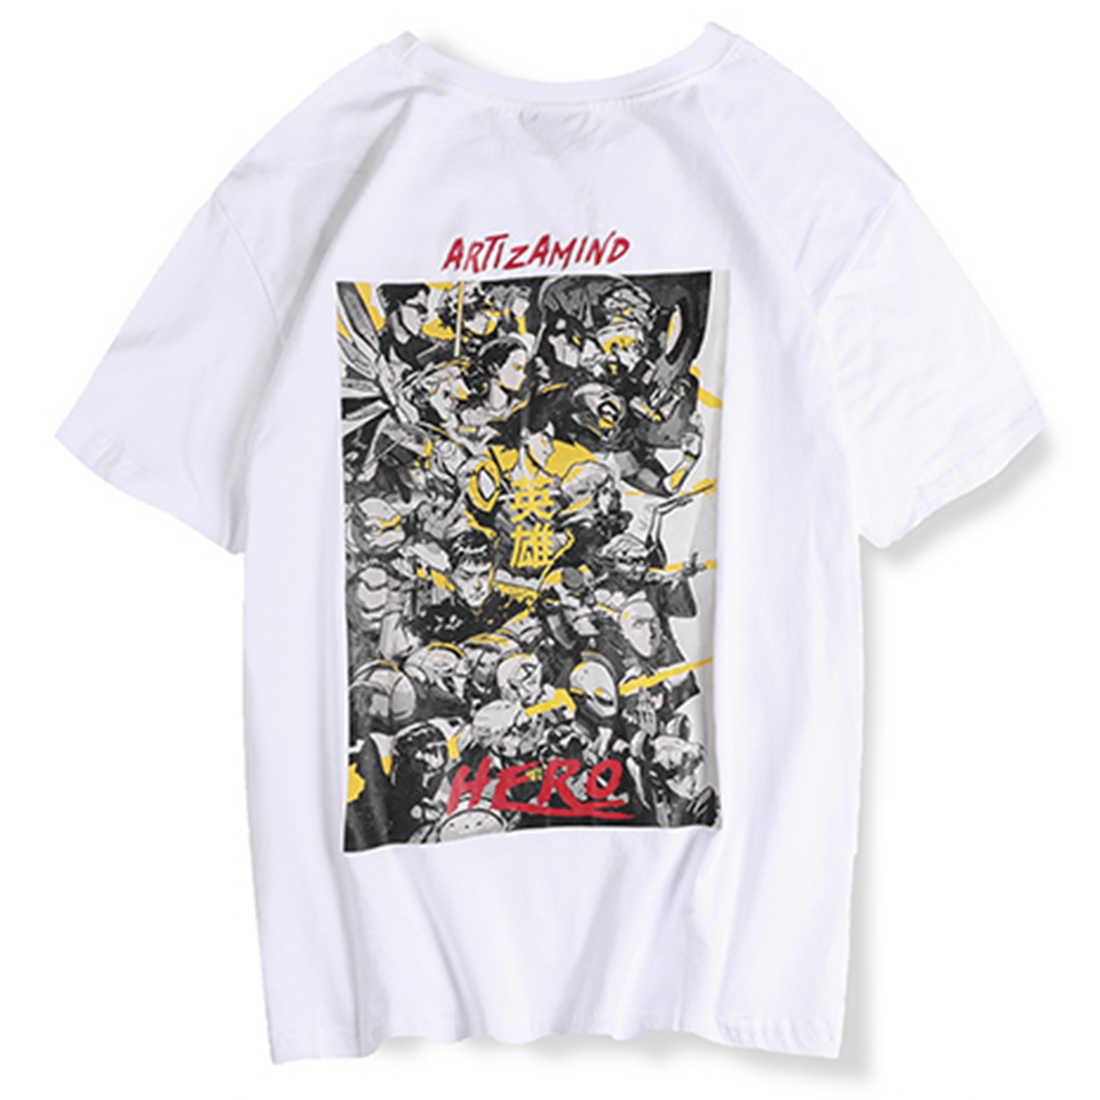 Aelfric Eden Japanse Stijl Gedrukt Casual Mens T-shirts 2019 Zomer Mode Harajuku Streetwear Hip Hop Katoenen Tops T-shirts